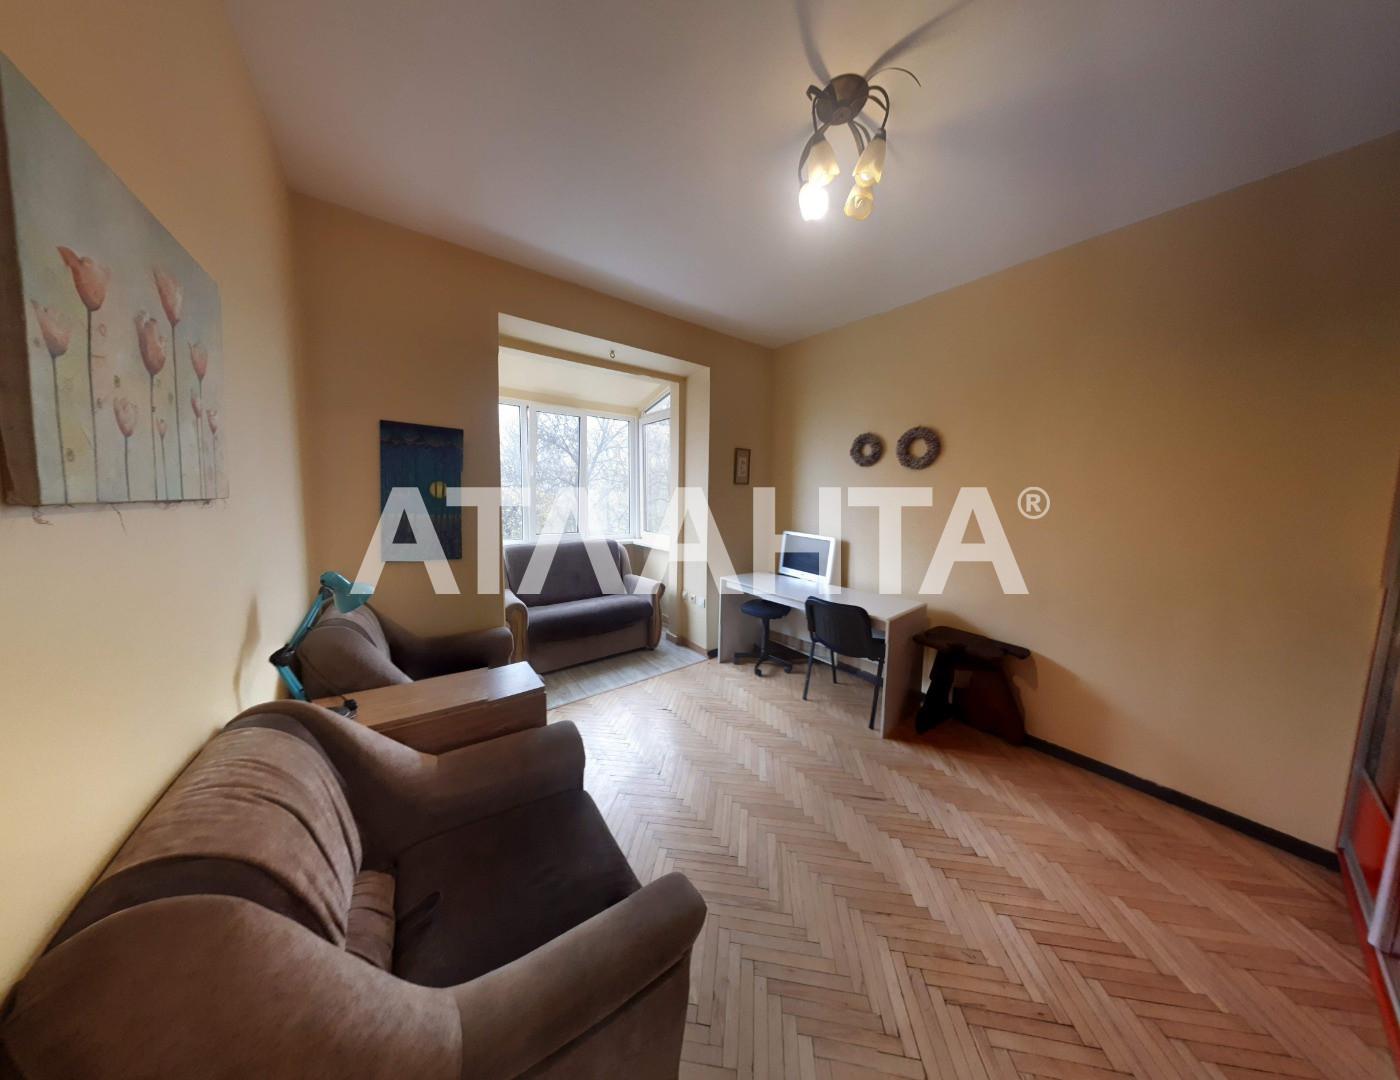 Продается 3-комнатная Квартира на ул. Просп.Науки — 64 900 у.е.